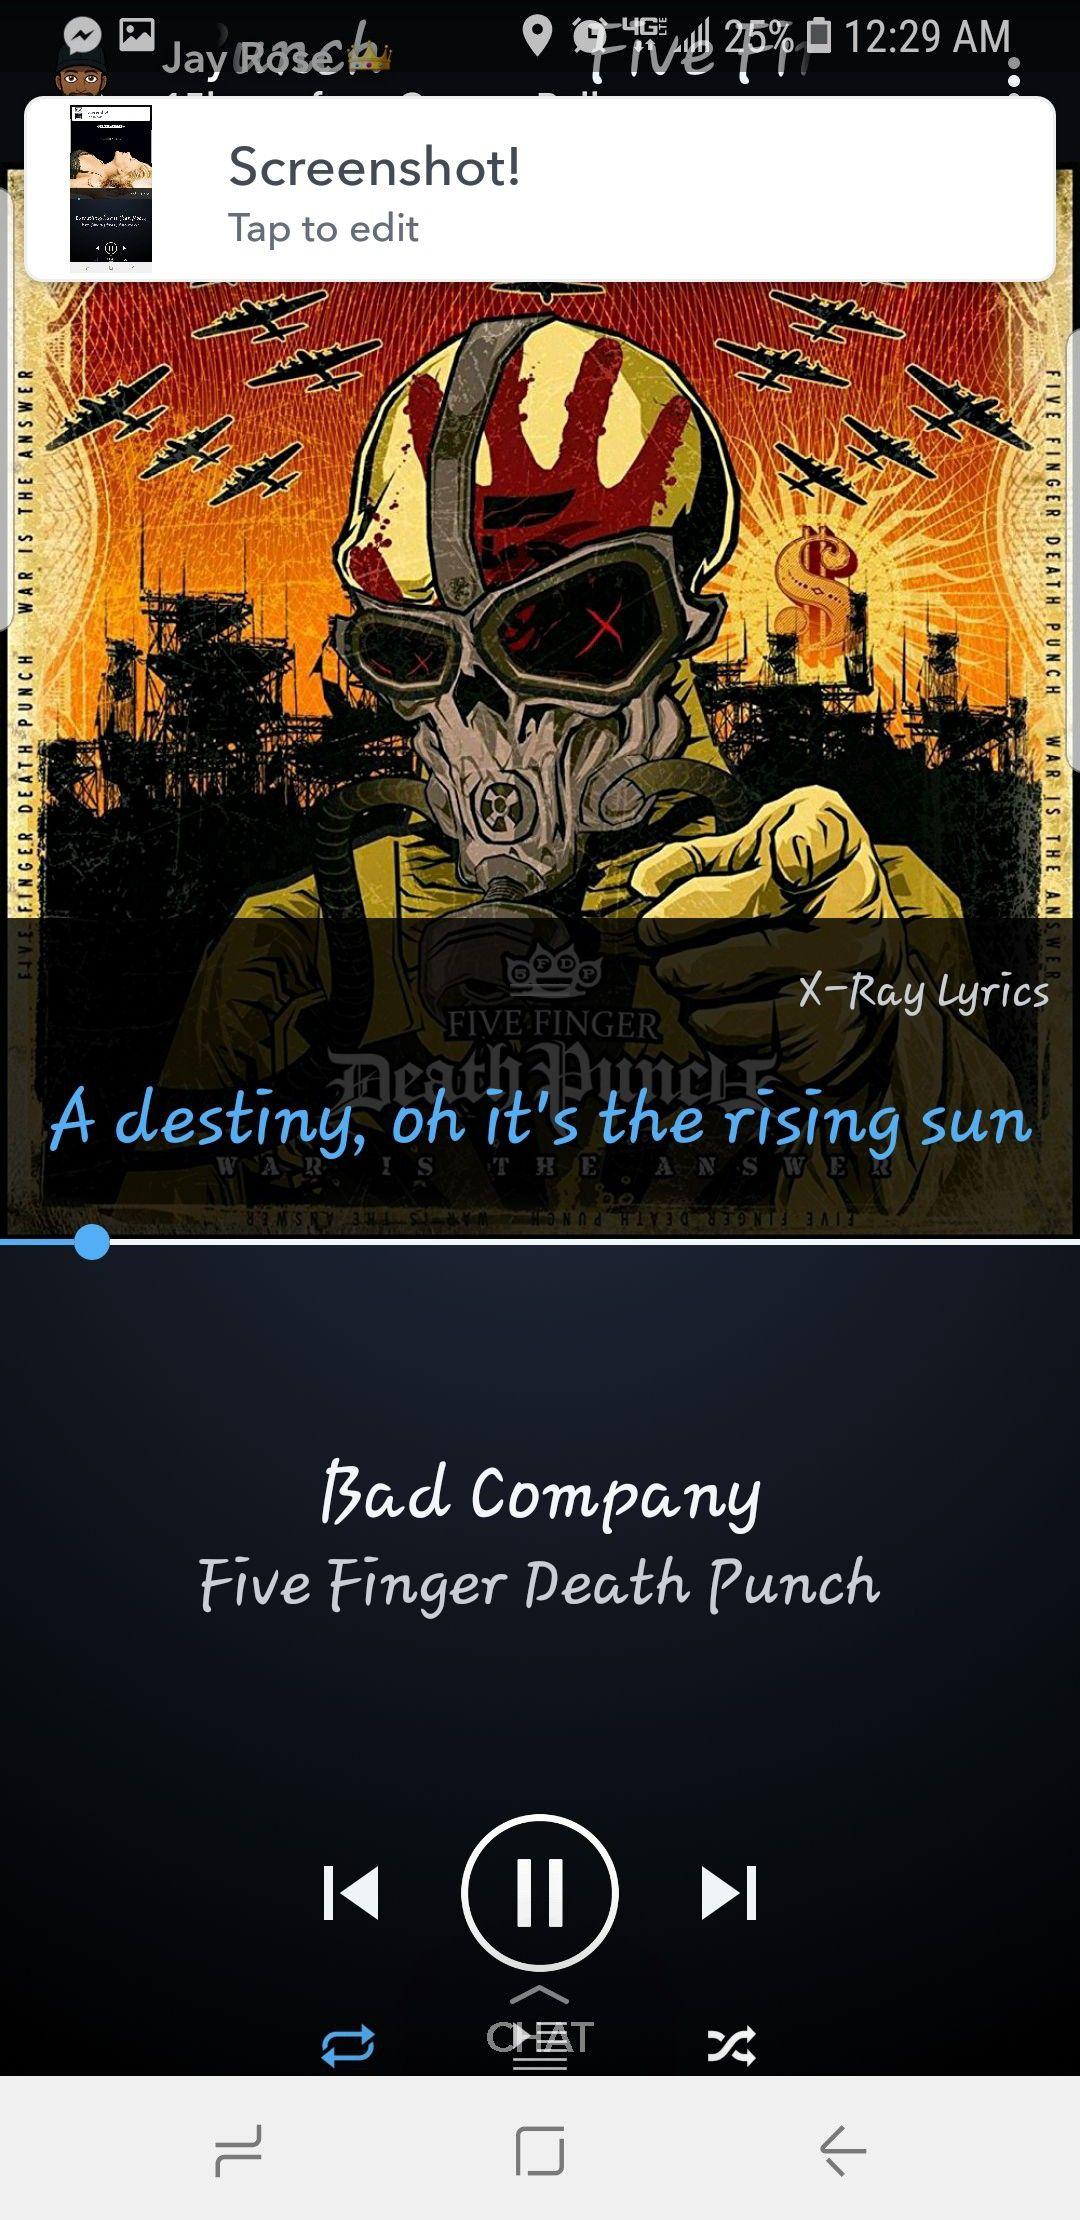 Five Finger Death Punch Rising Sun